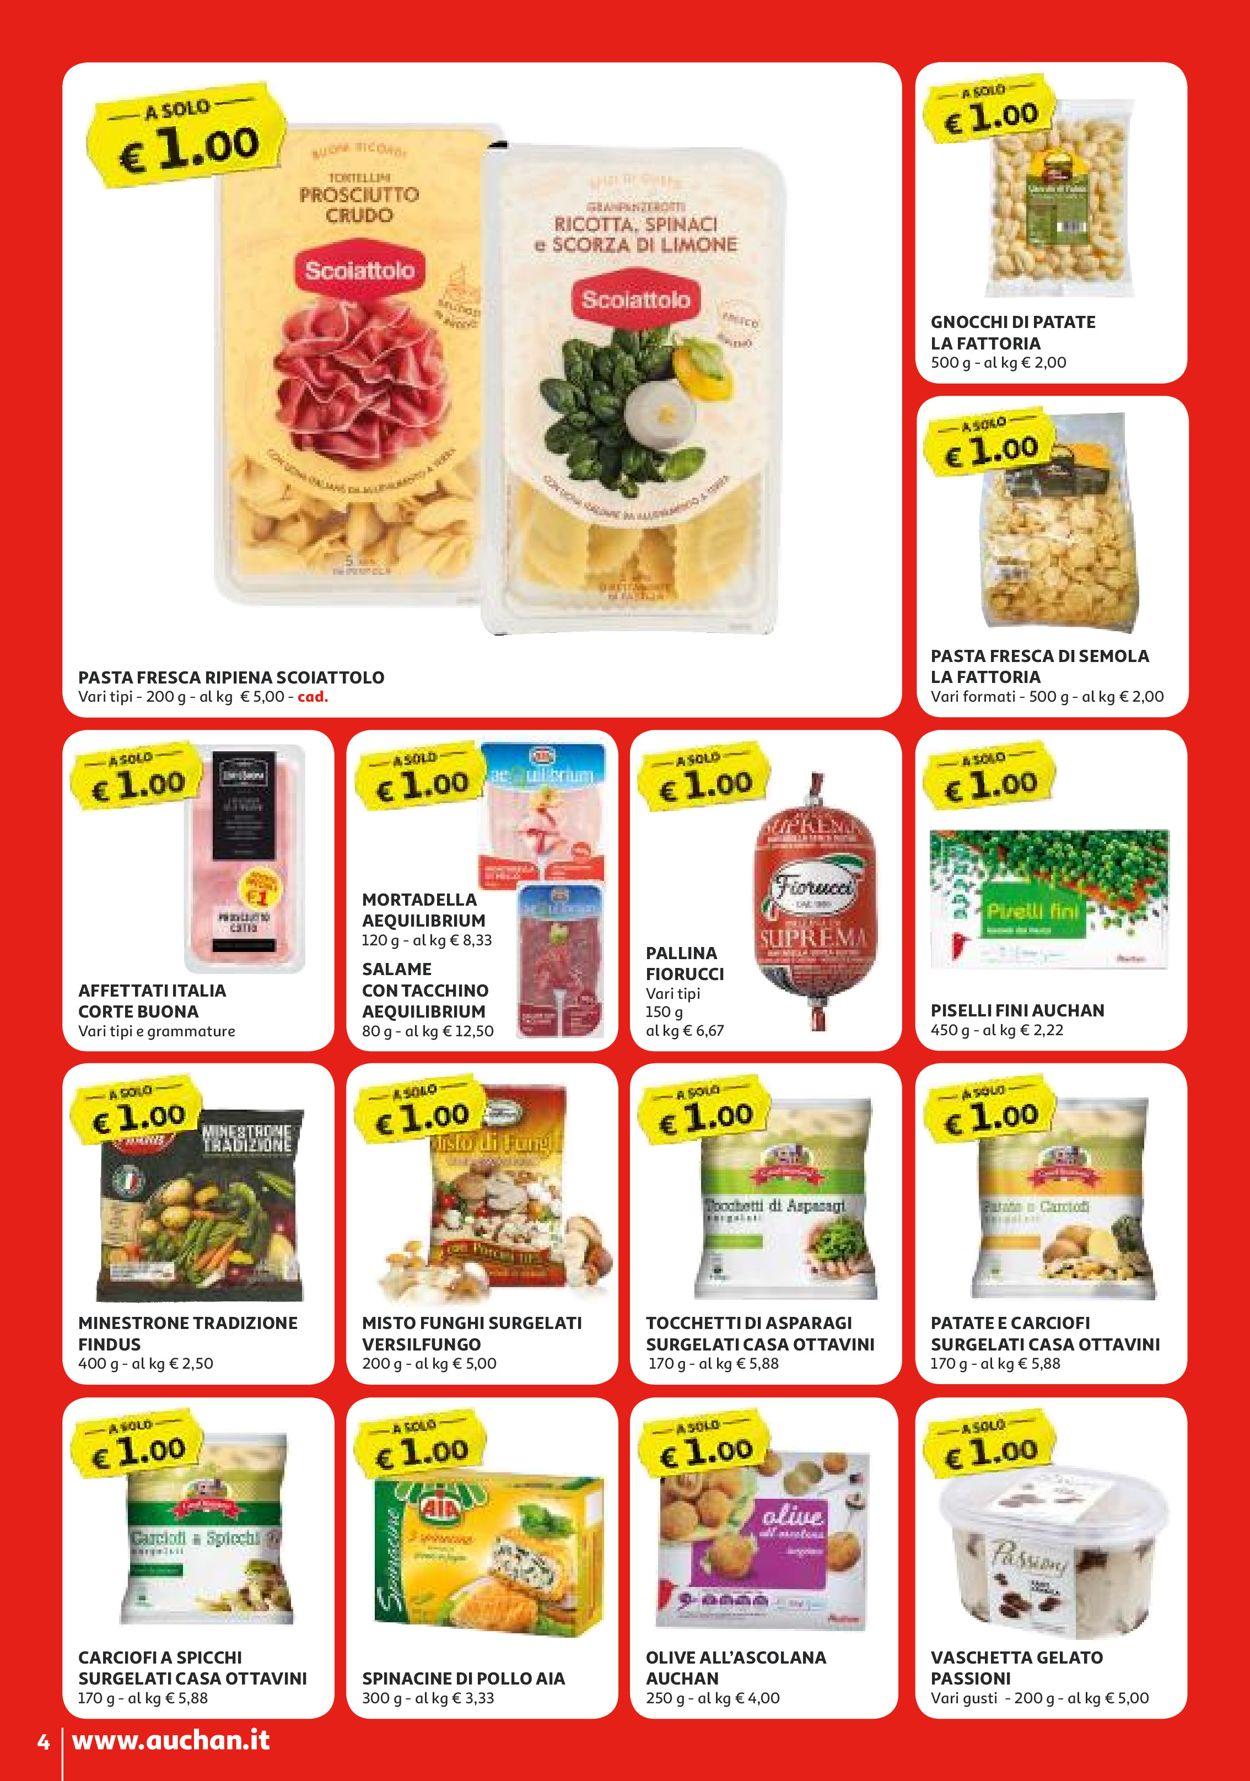 Volantino Auchan - Offerte 14/04-22/04/2020 (Pagina 4)